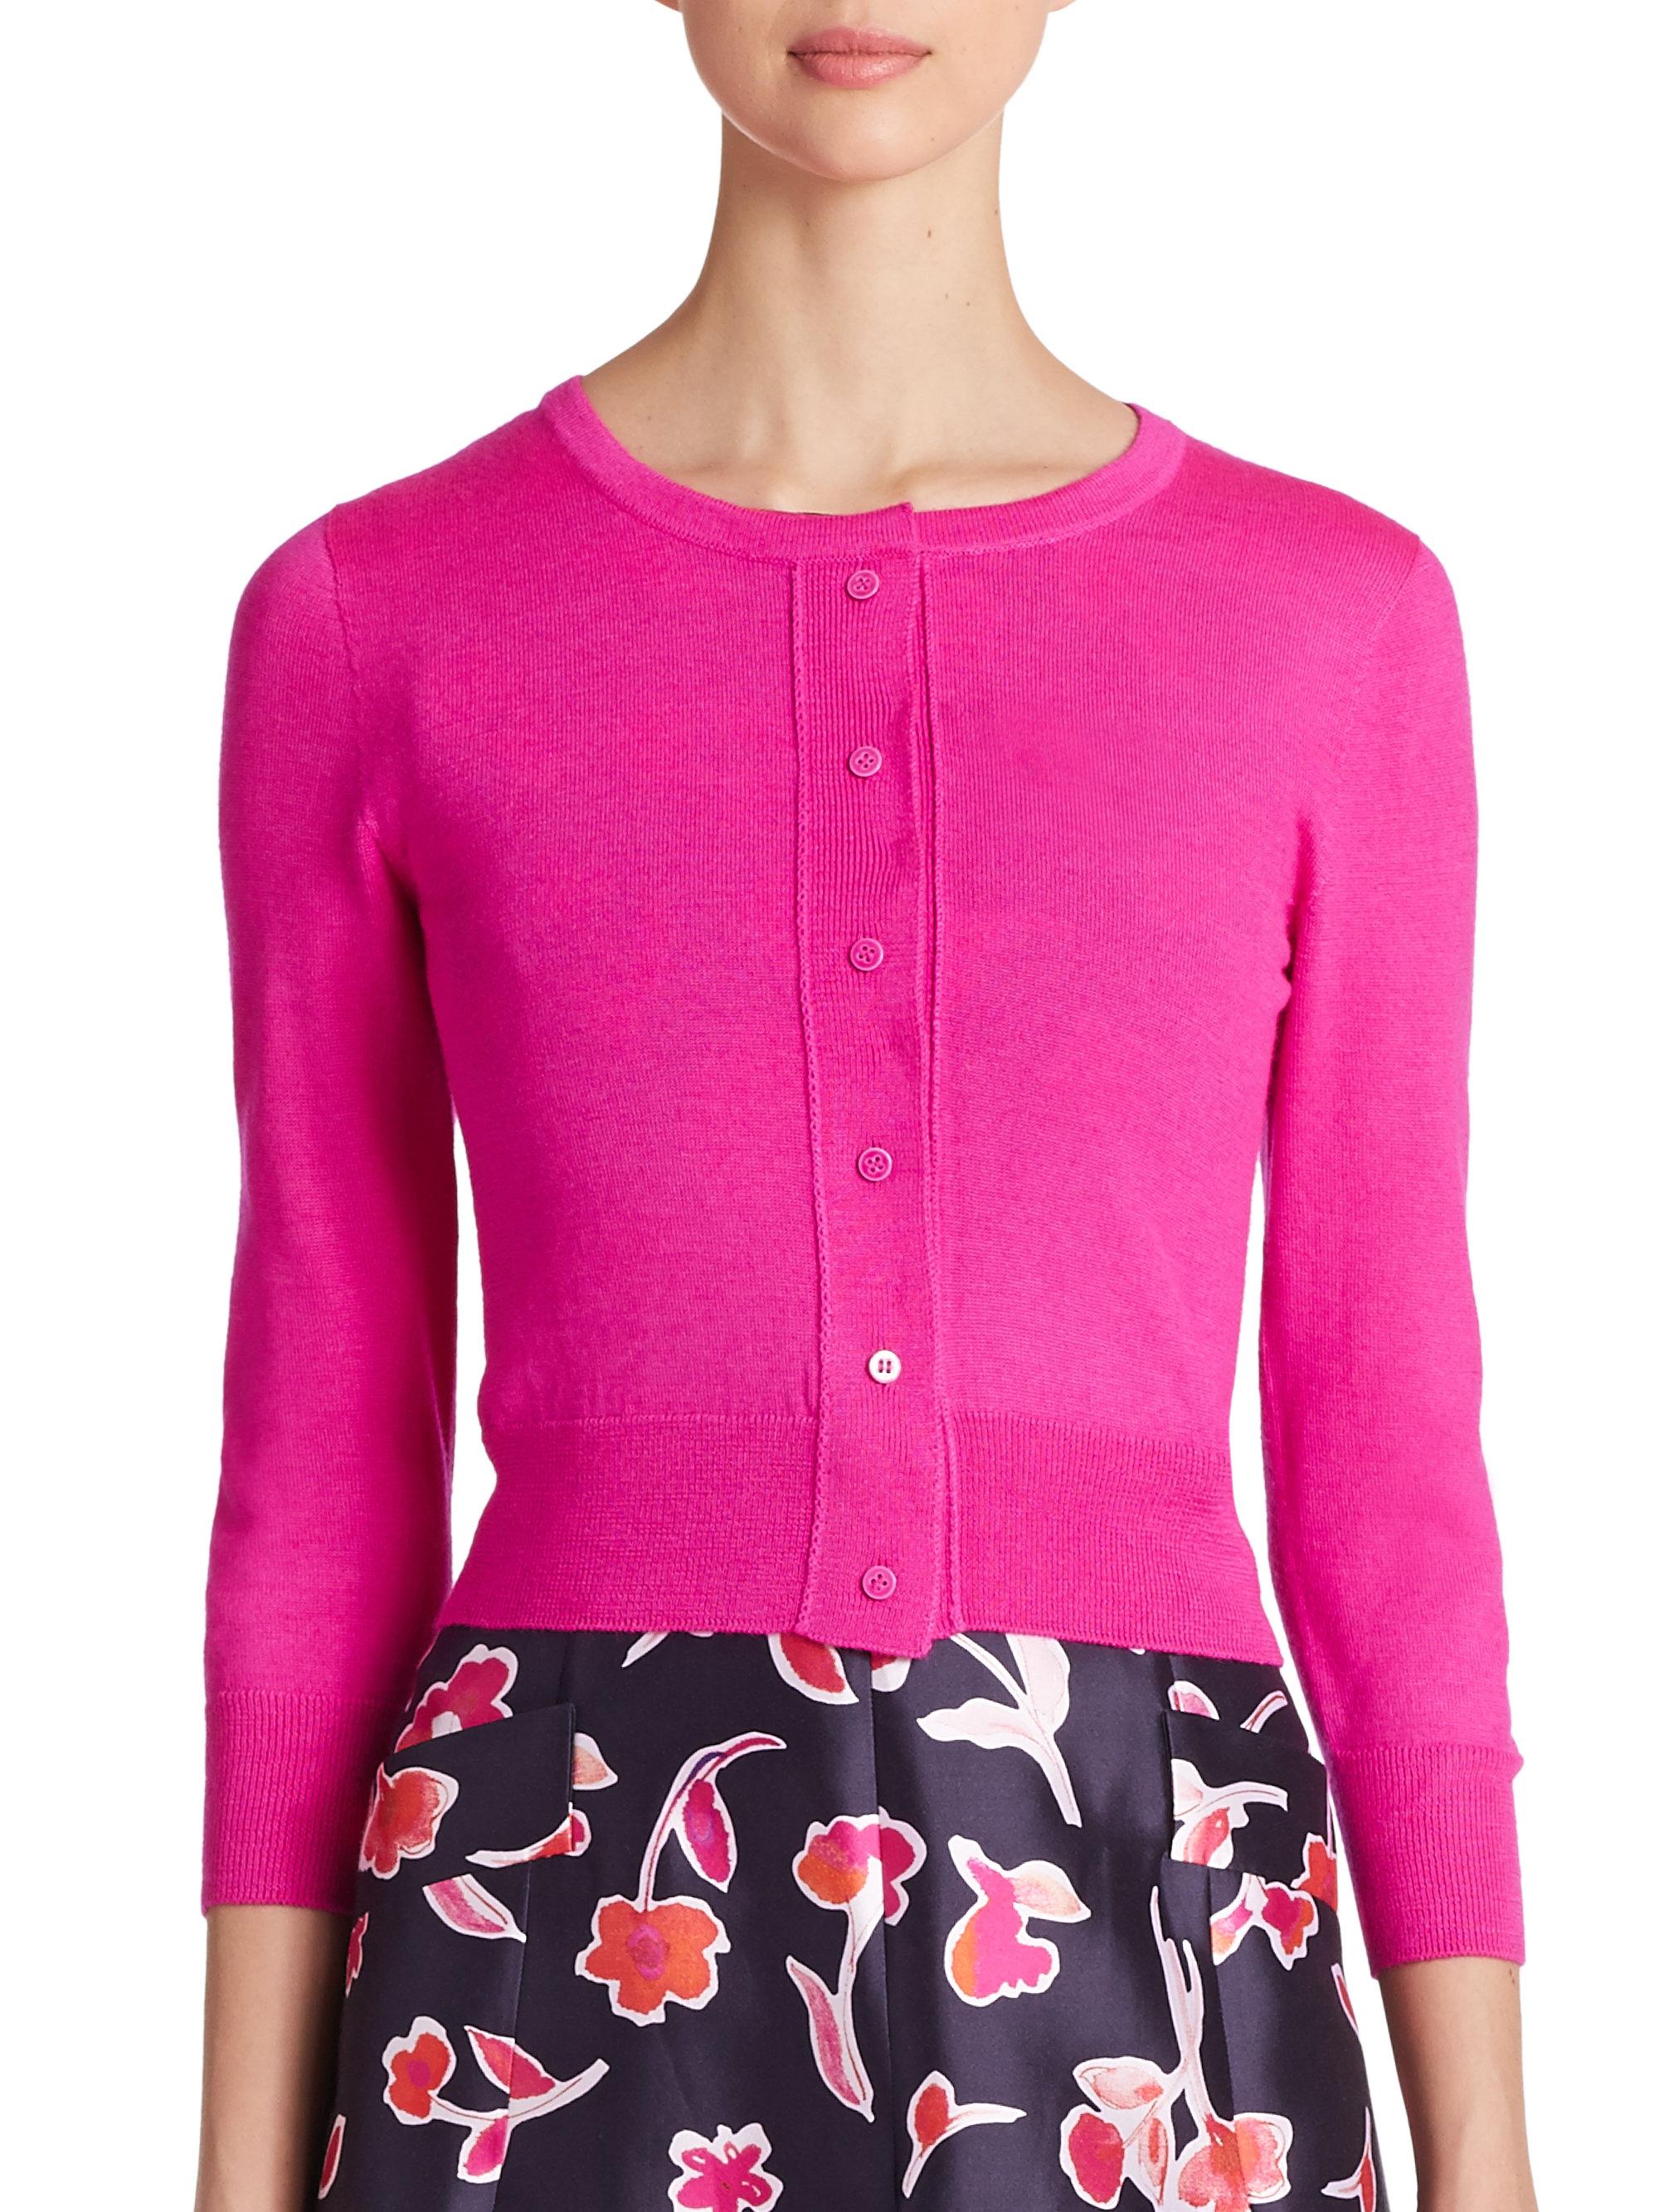 Oscar de la renta Cropped Silk Cashmere Cardigan in Pink | Lyst